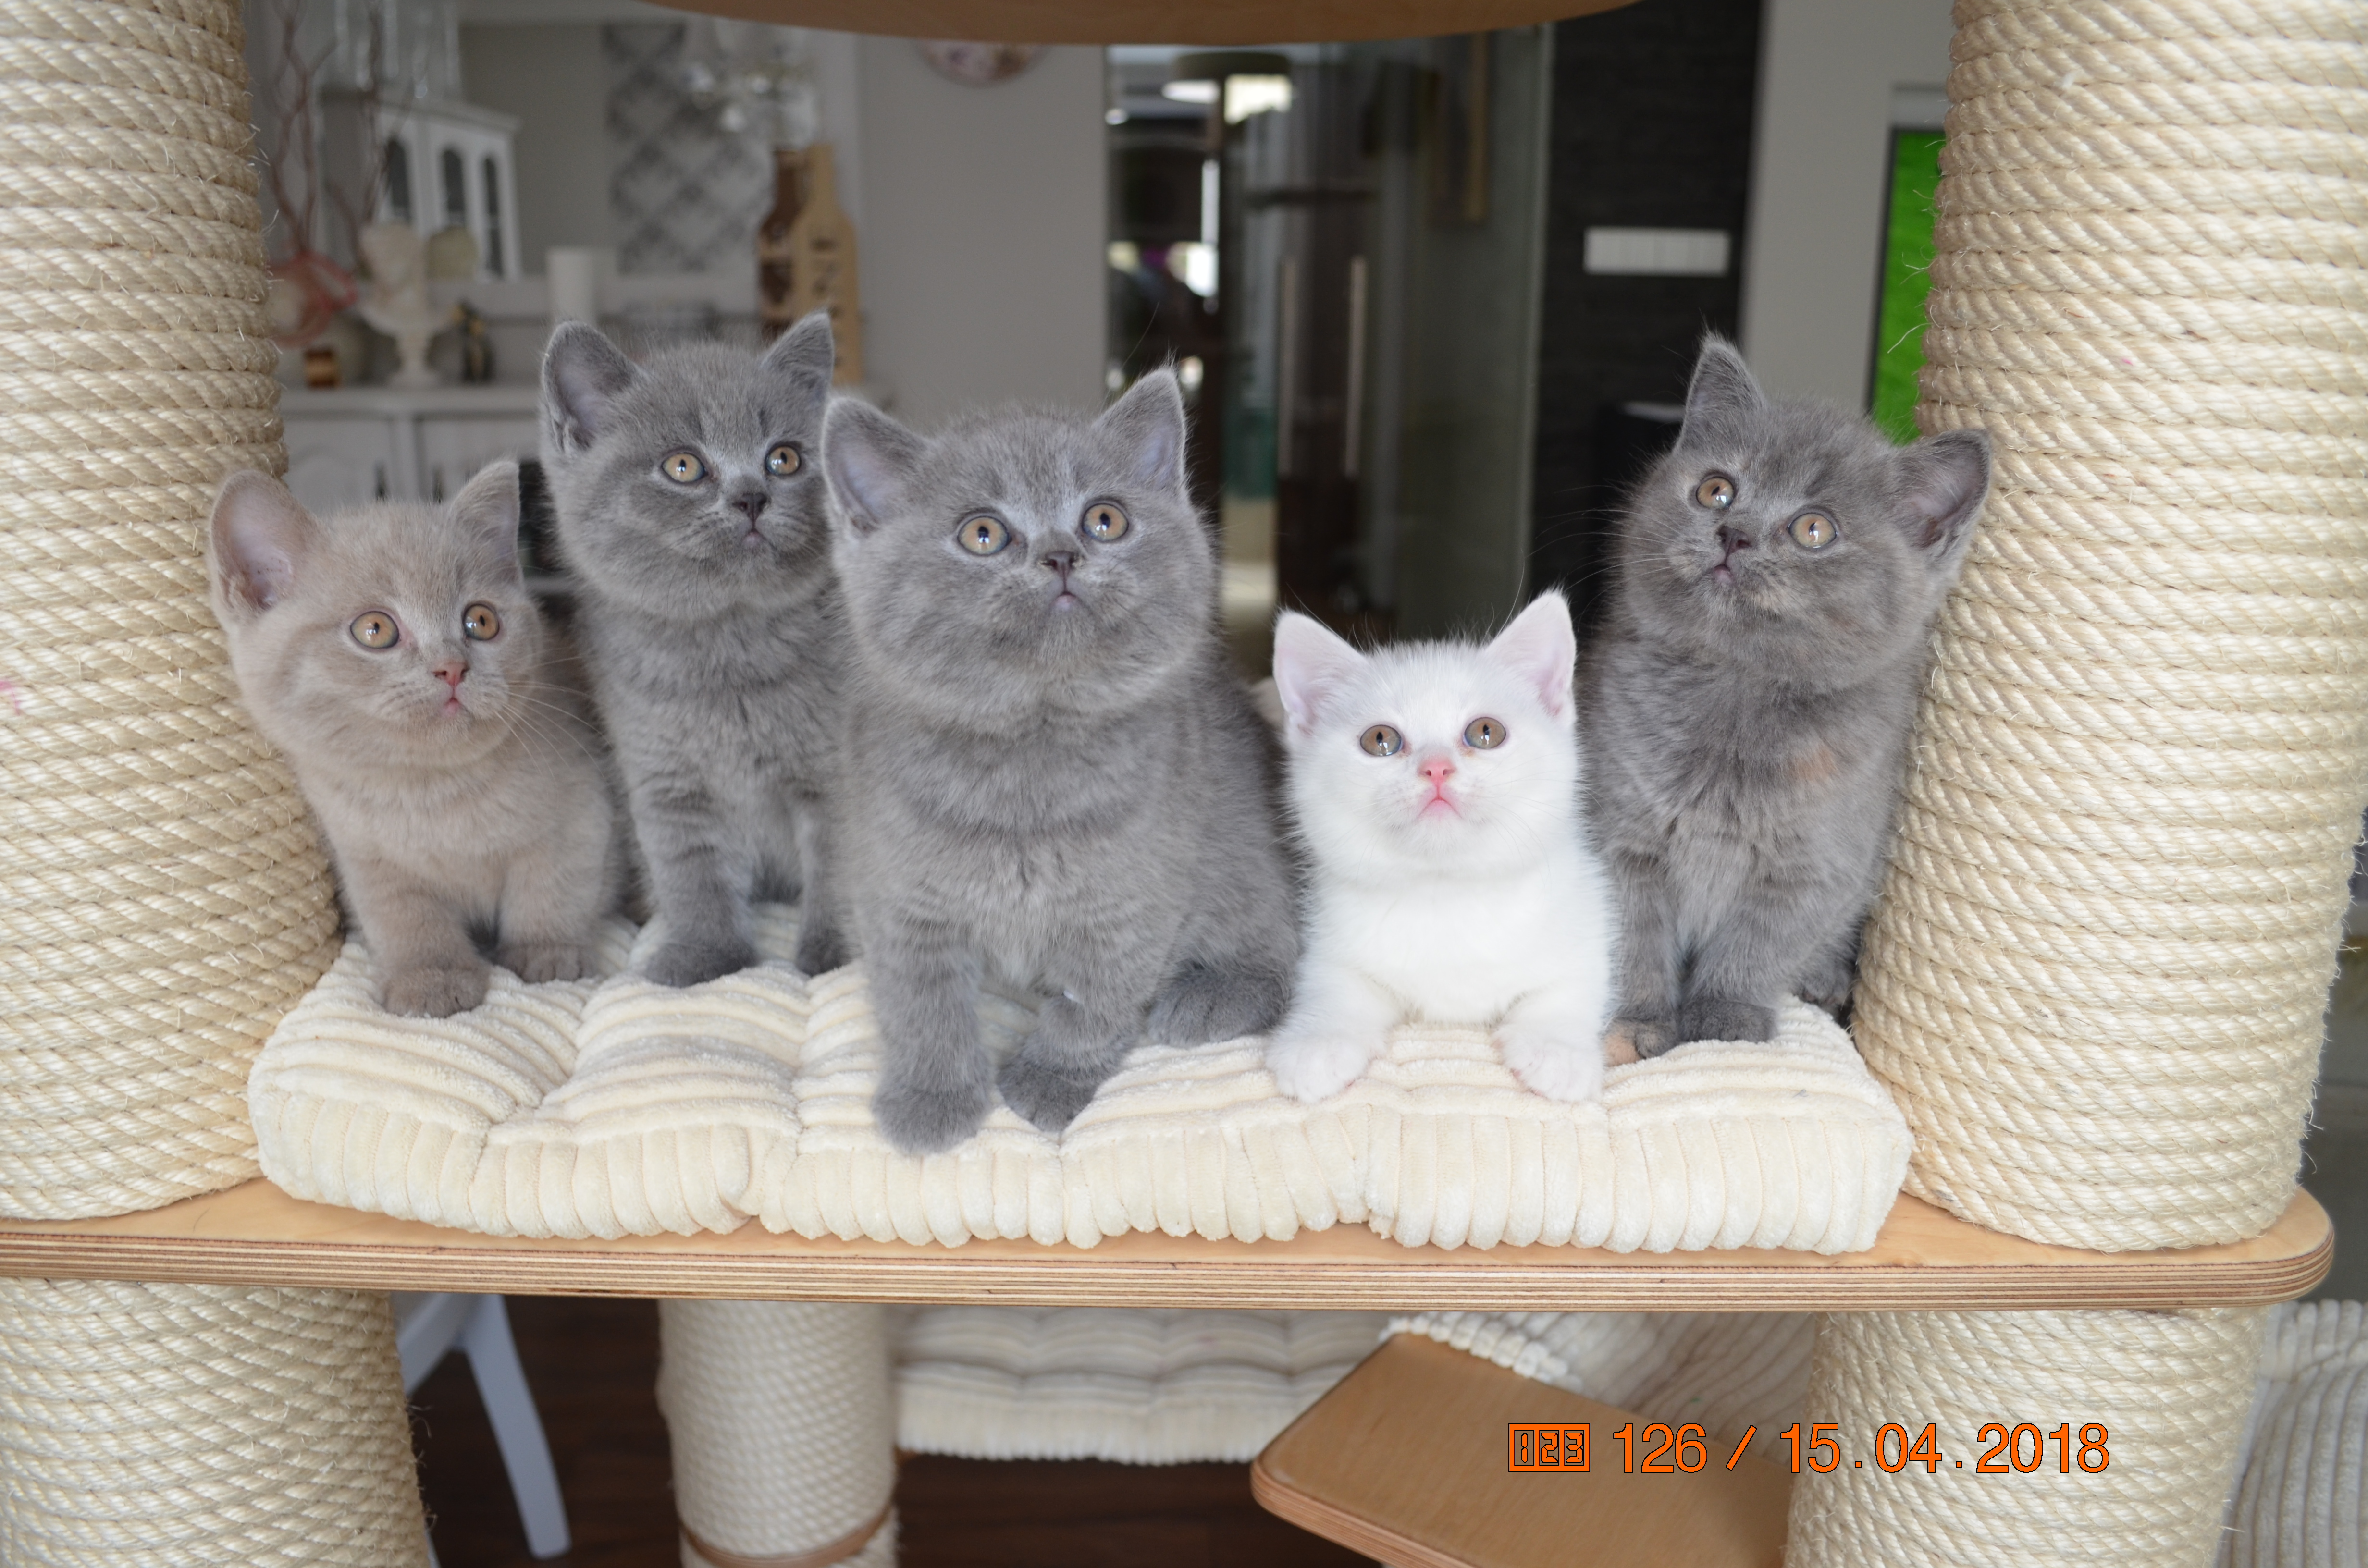 """Kto posiada kota, nie musi bać się samotności"""